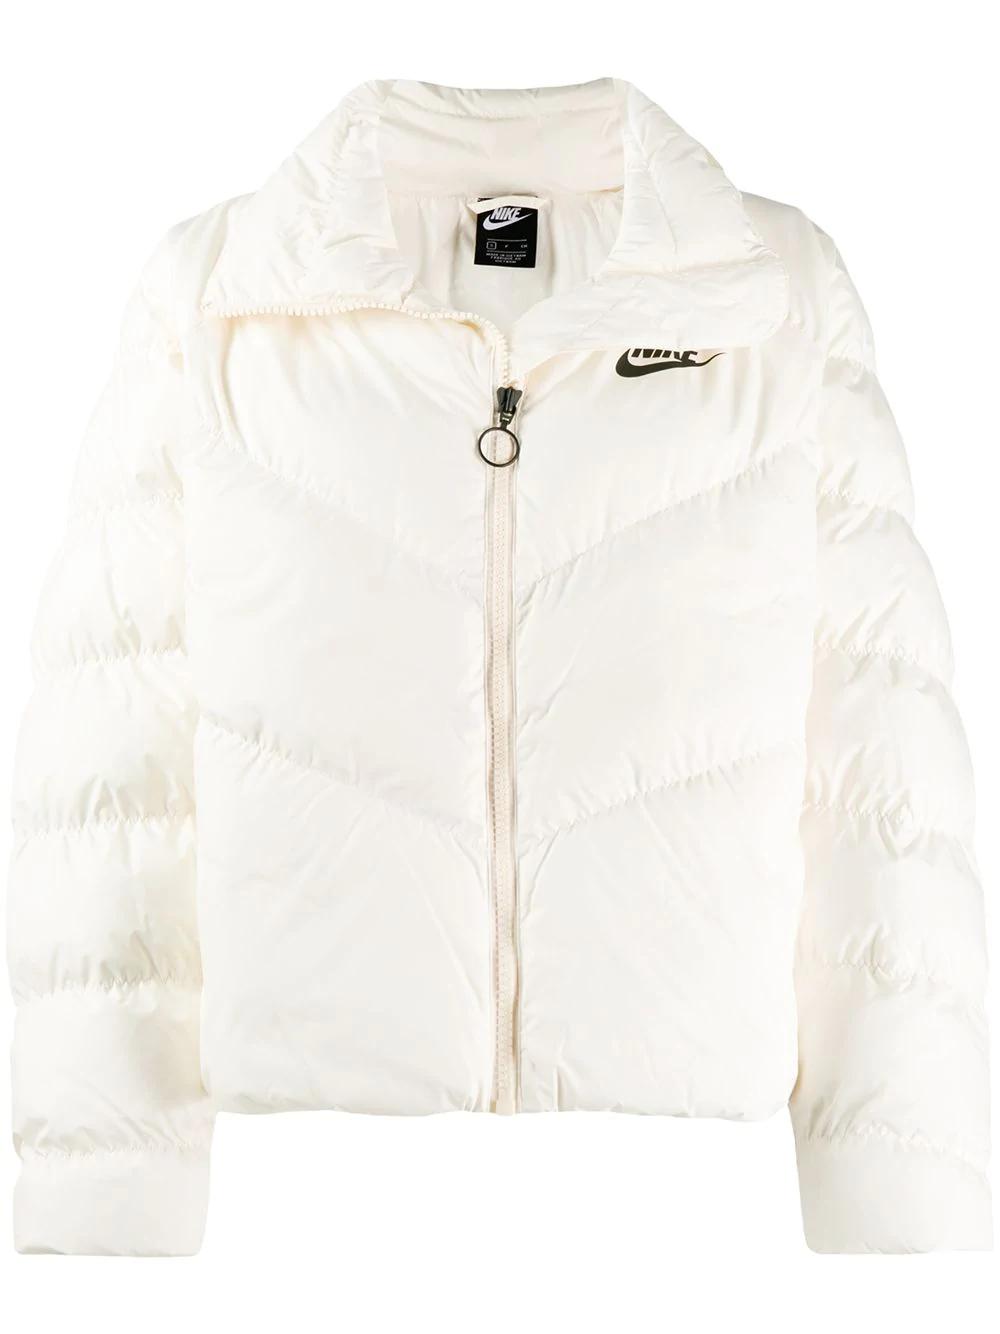 Nike Logo Print Puffer Jacket Farfetch Com Jackets Nike Jackets Women Puffer Jackets [ 1334 x 1000 Pixel ]